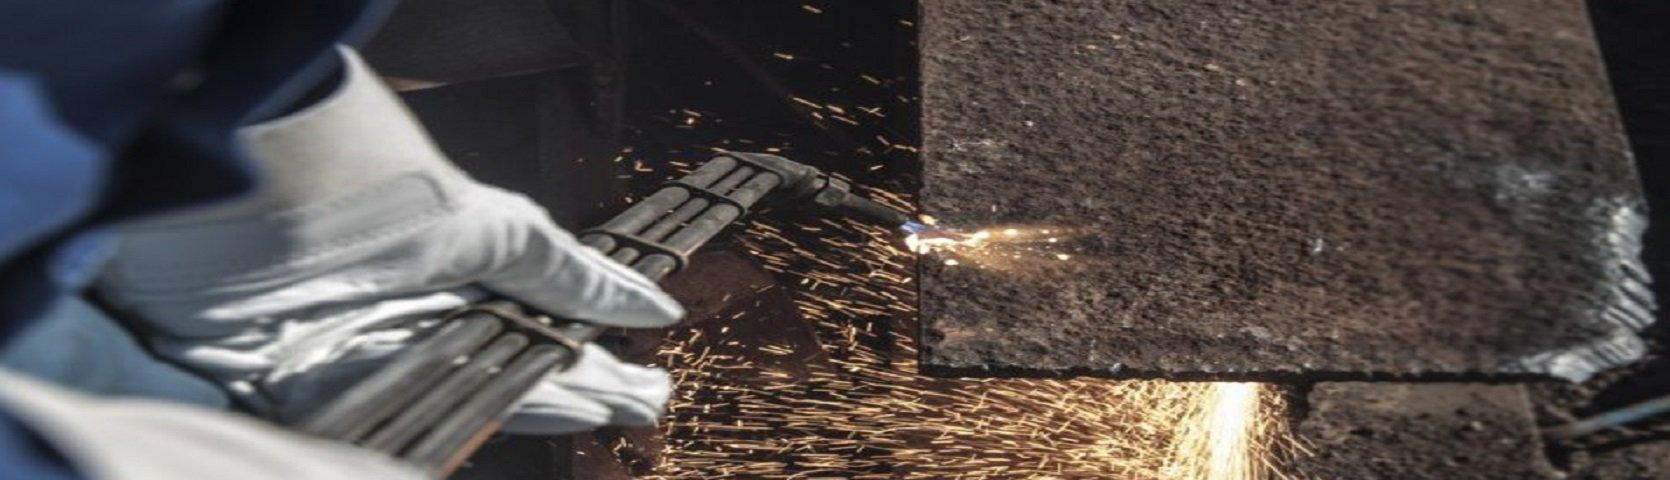 Grunske Metall-Recycling GmbH & Co. KG